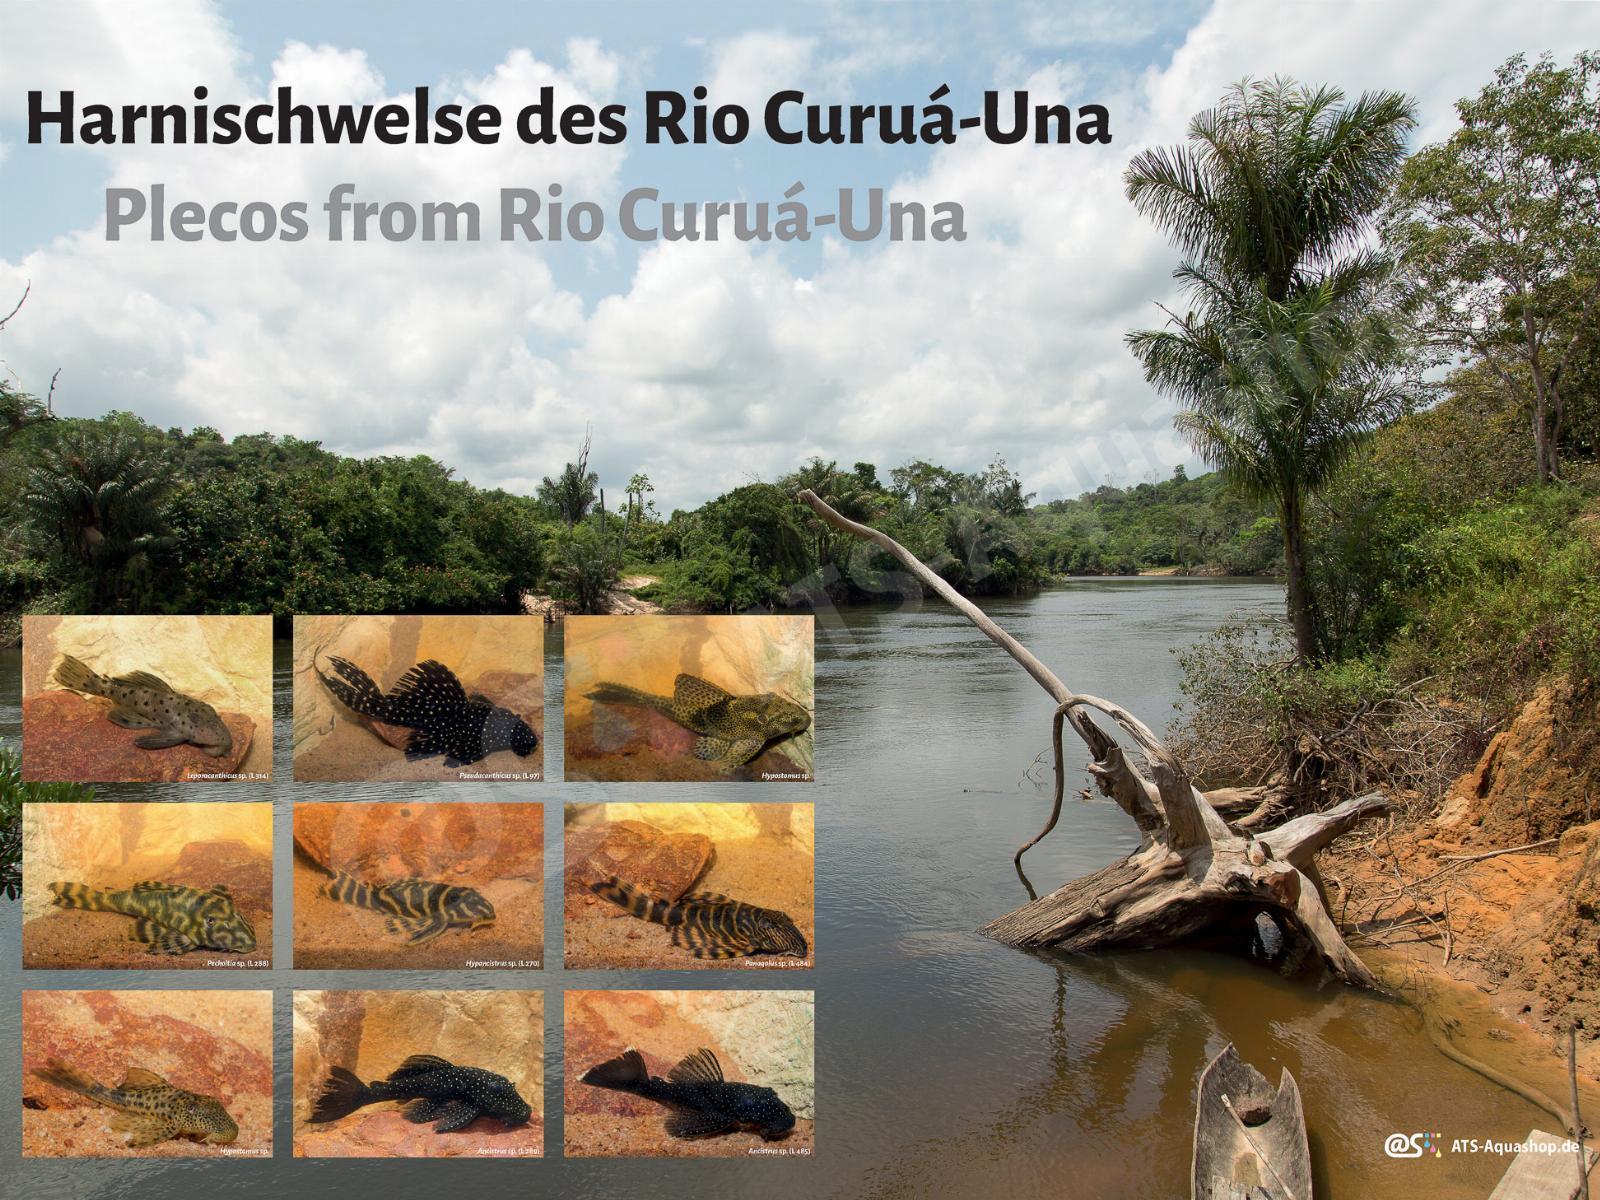 Posters: Plecos from Rio Curuá-Una (Andreas Tanke)